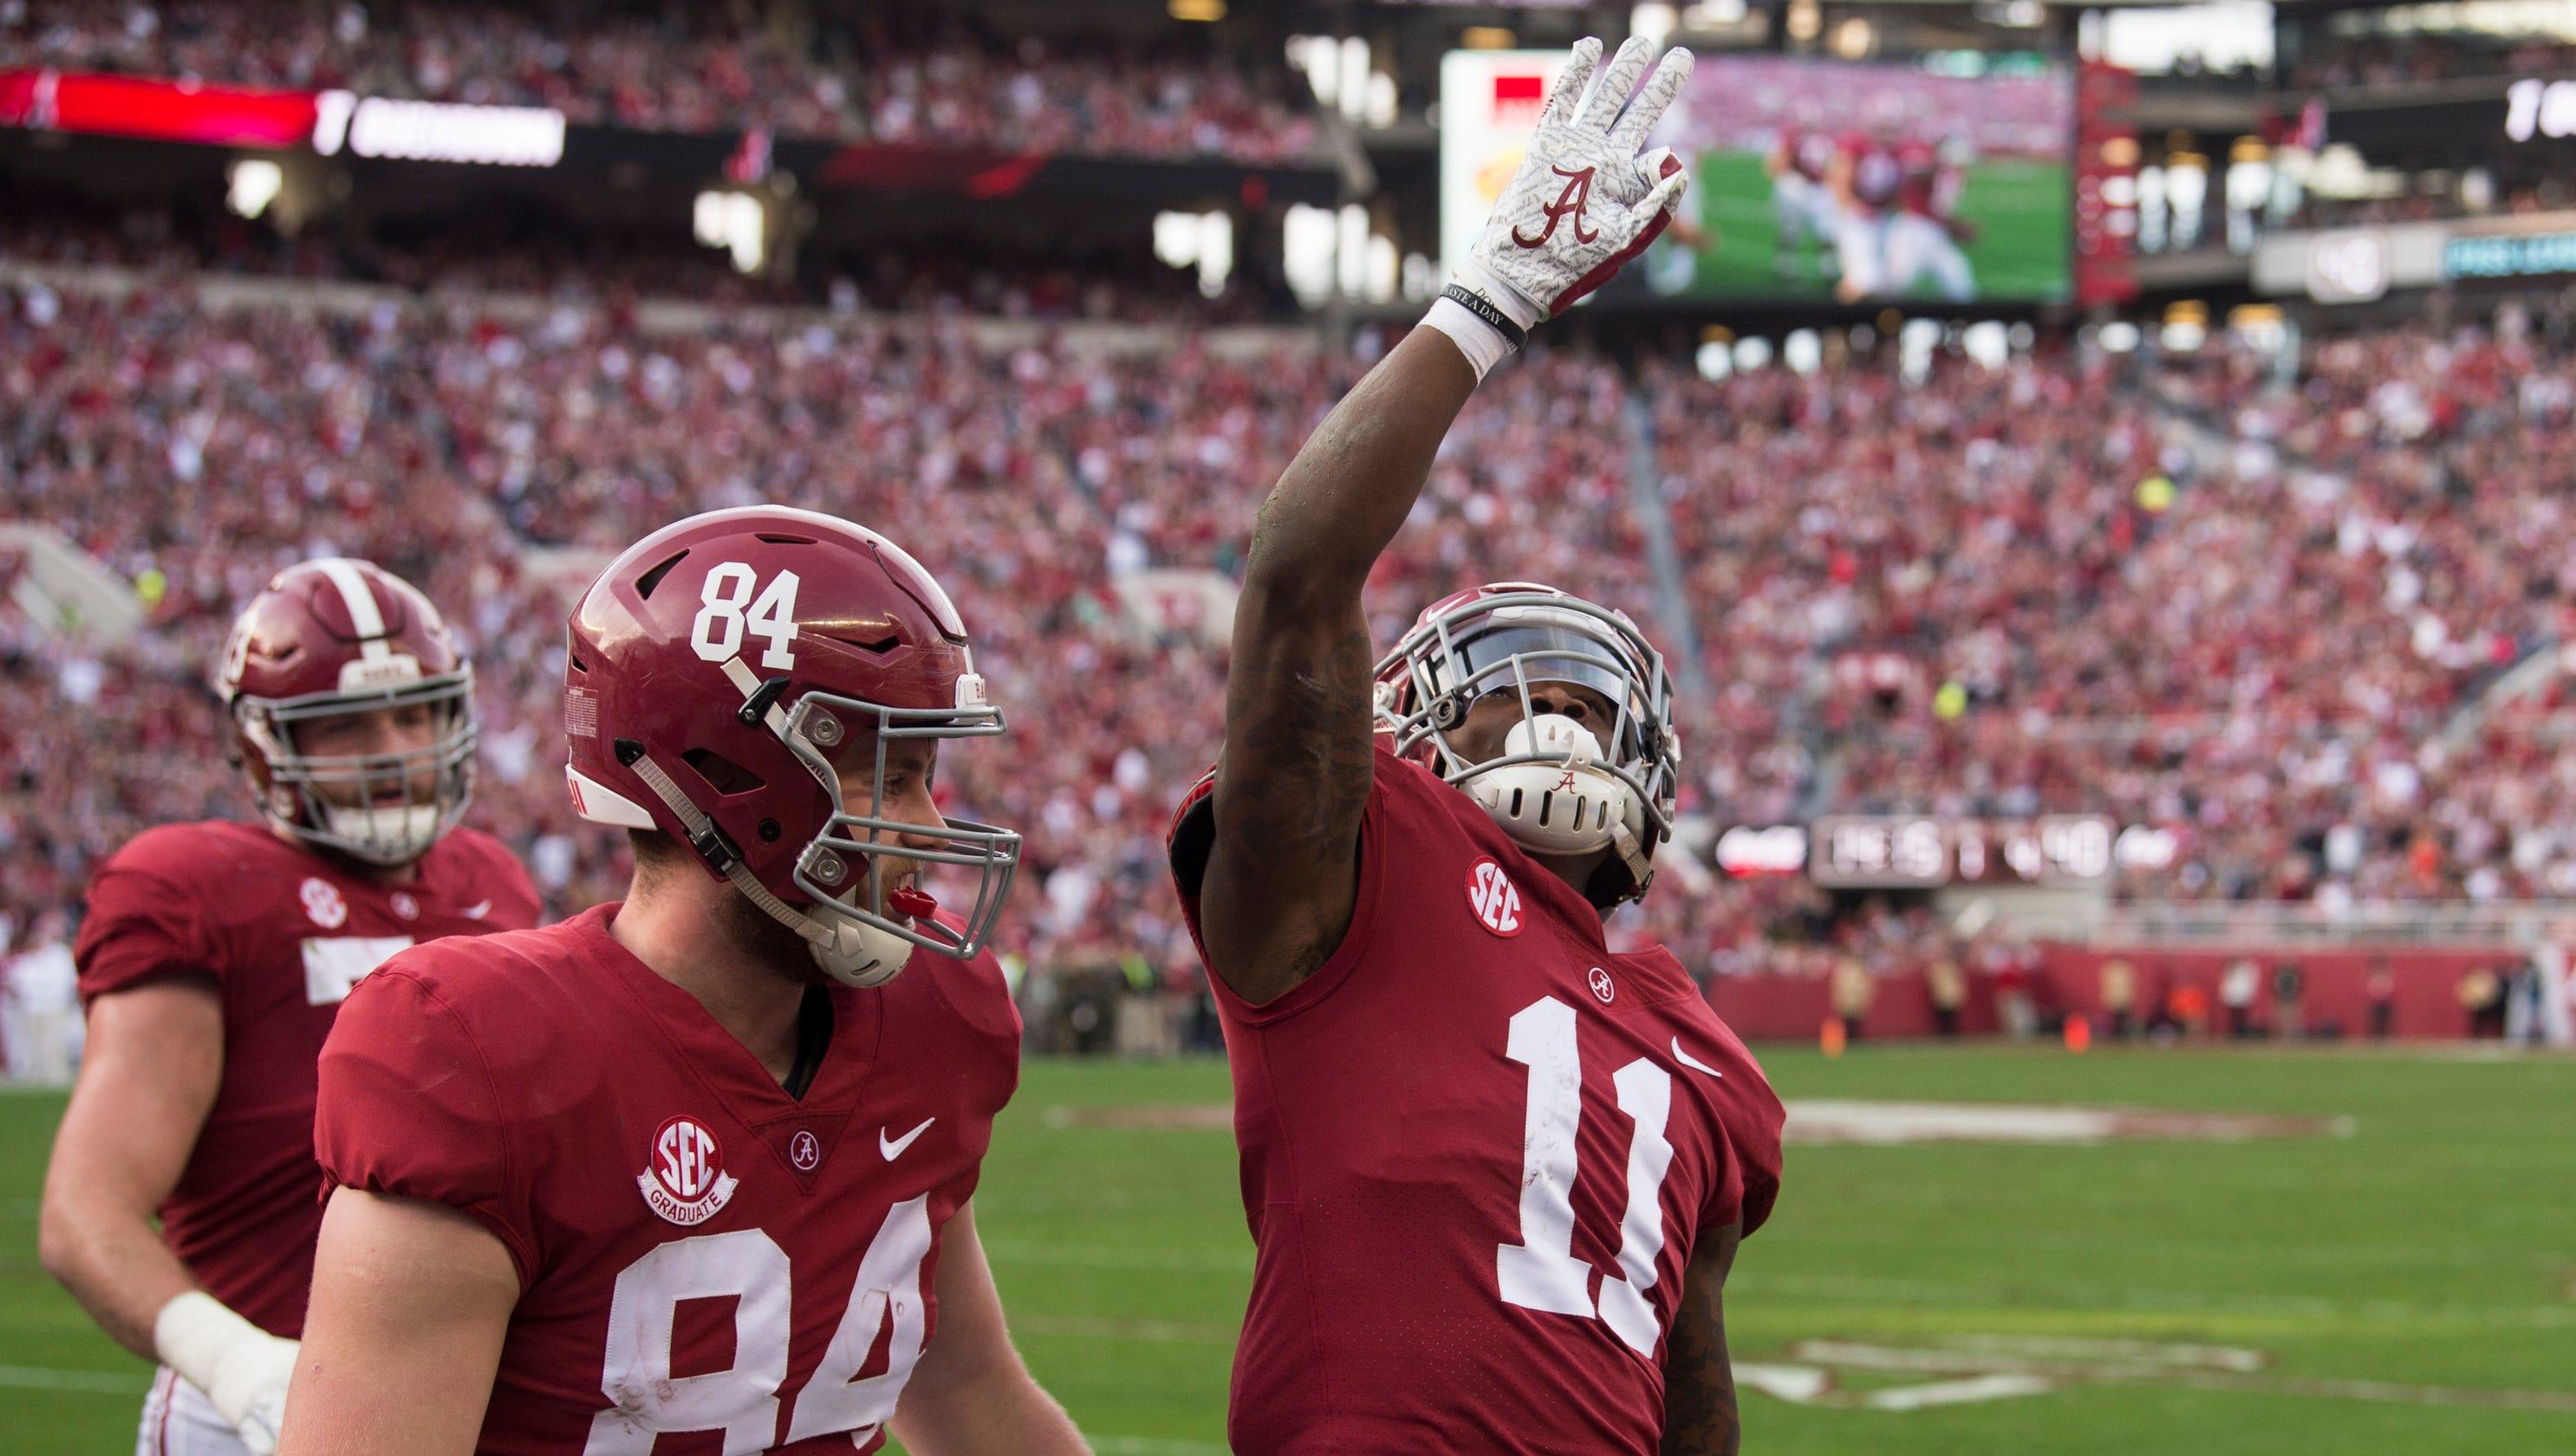 Iron Bowl scoring summary: Alabama vs. Auburn